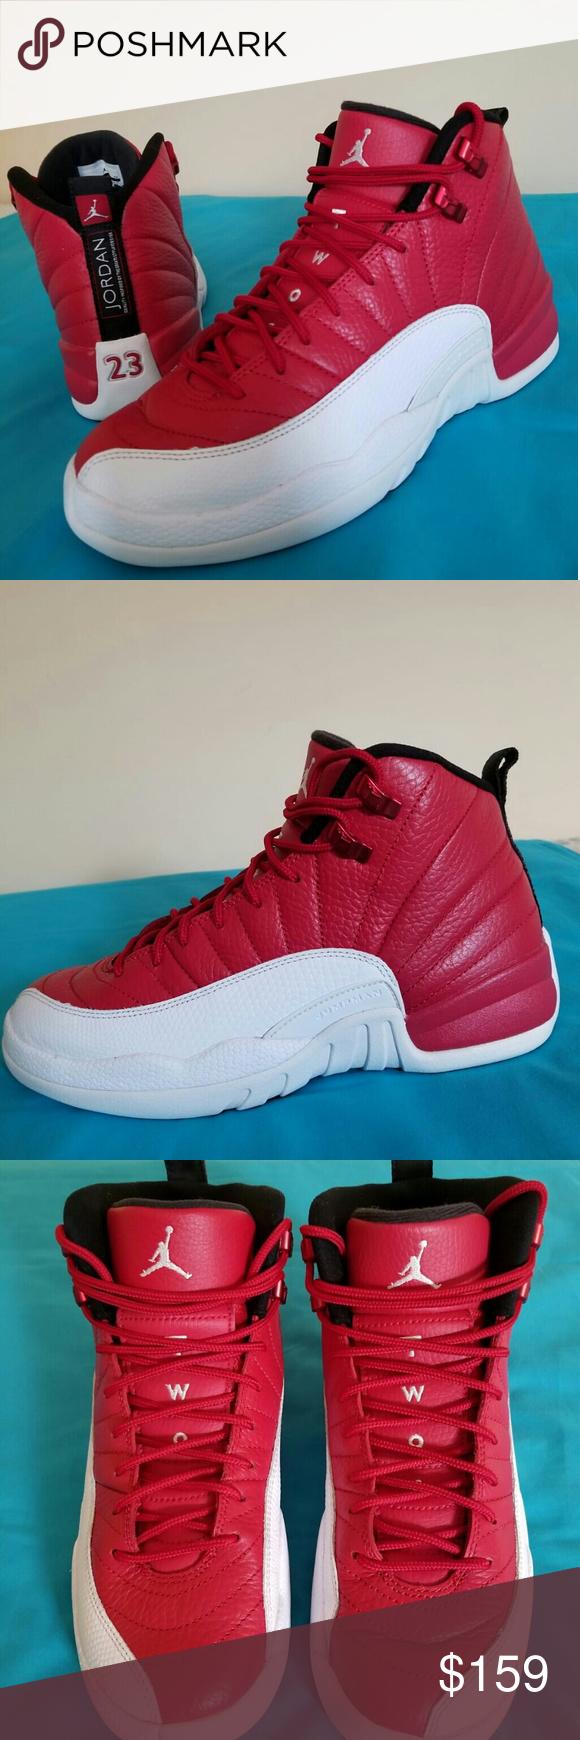 detailed look 522a4 805a2 Nike Air Jordan 12 Retro Gym Red Alt Size 7 MEN For MEN SIZE ...